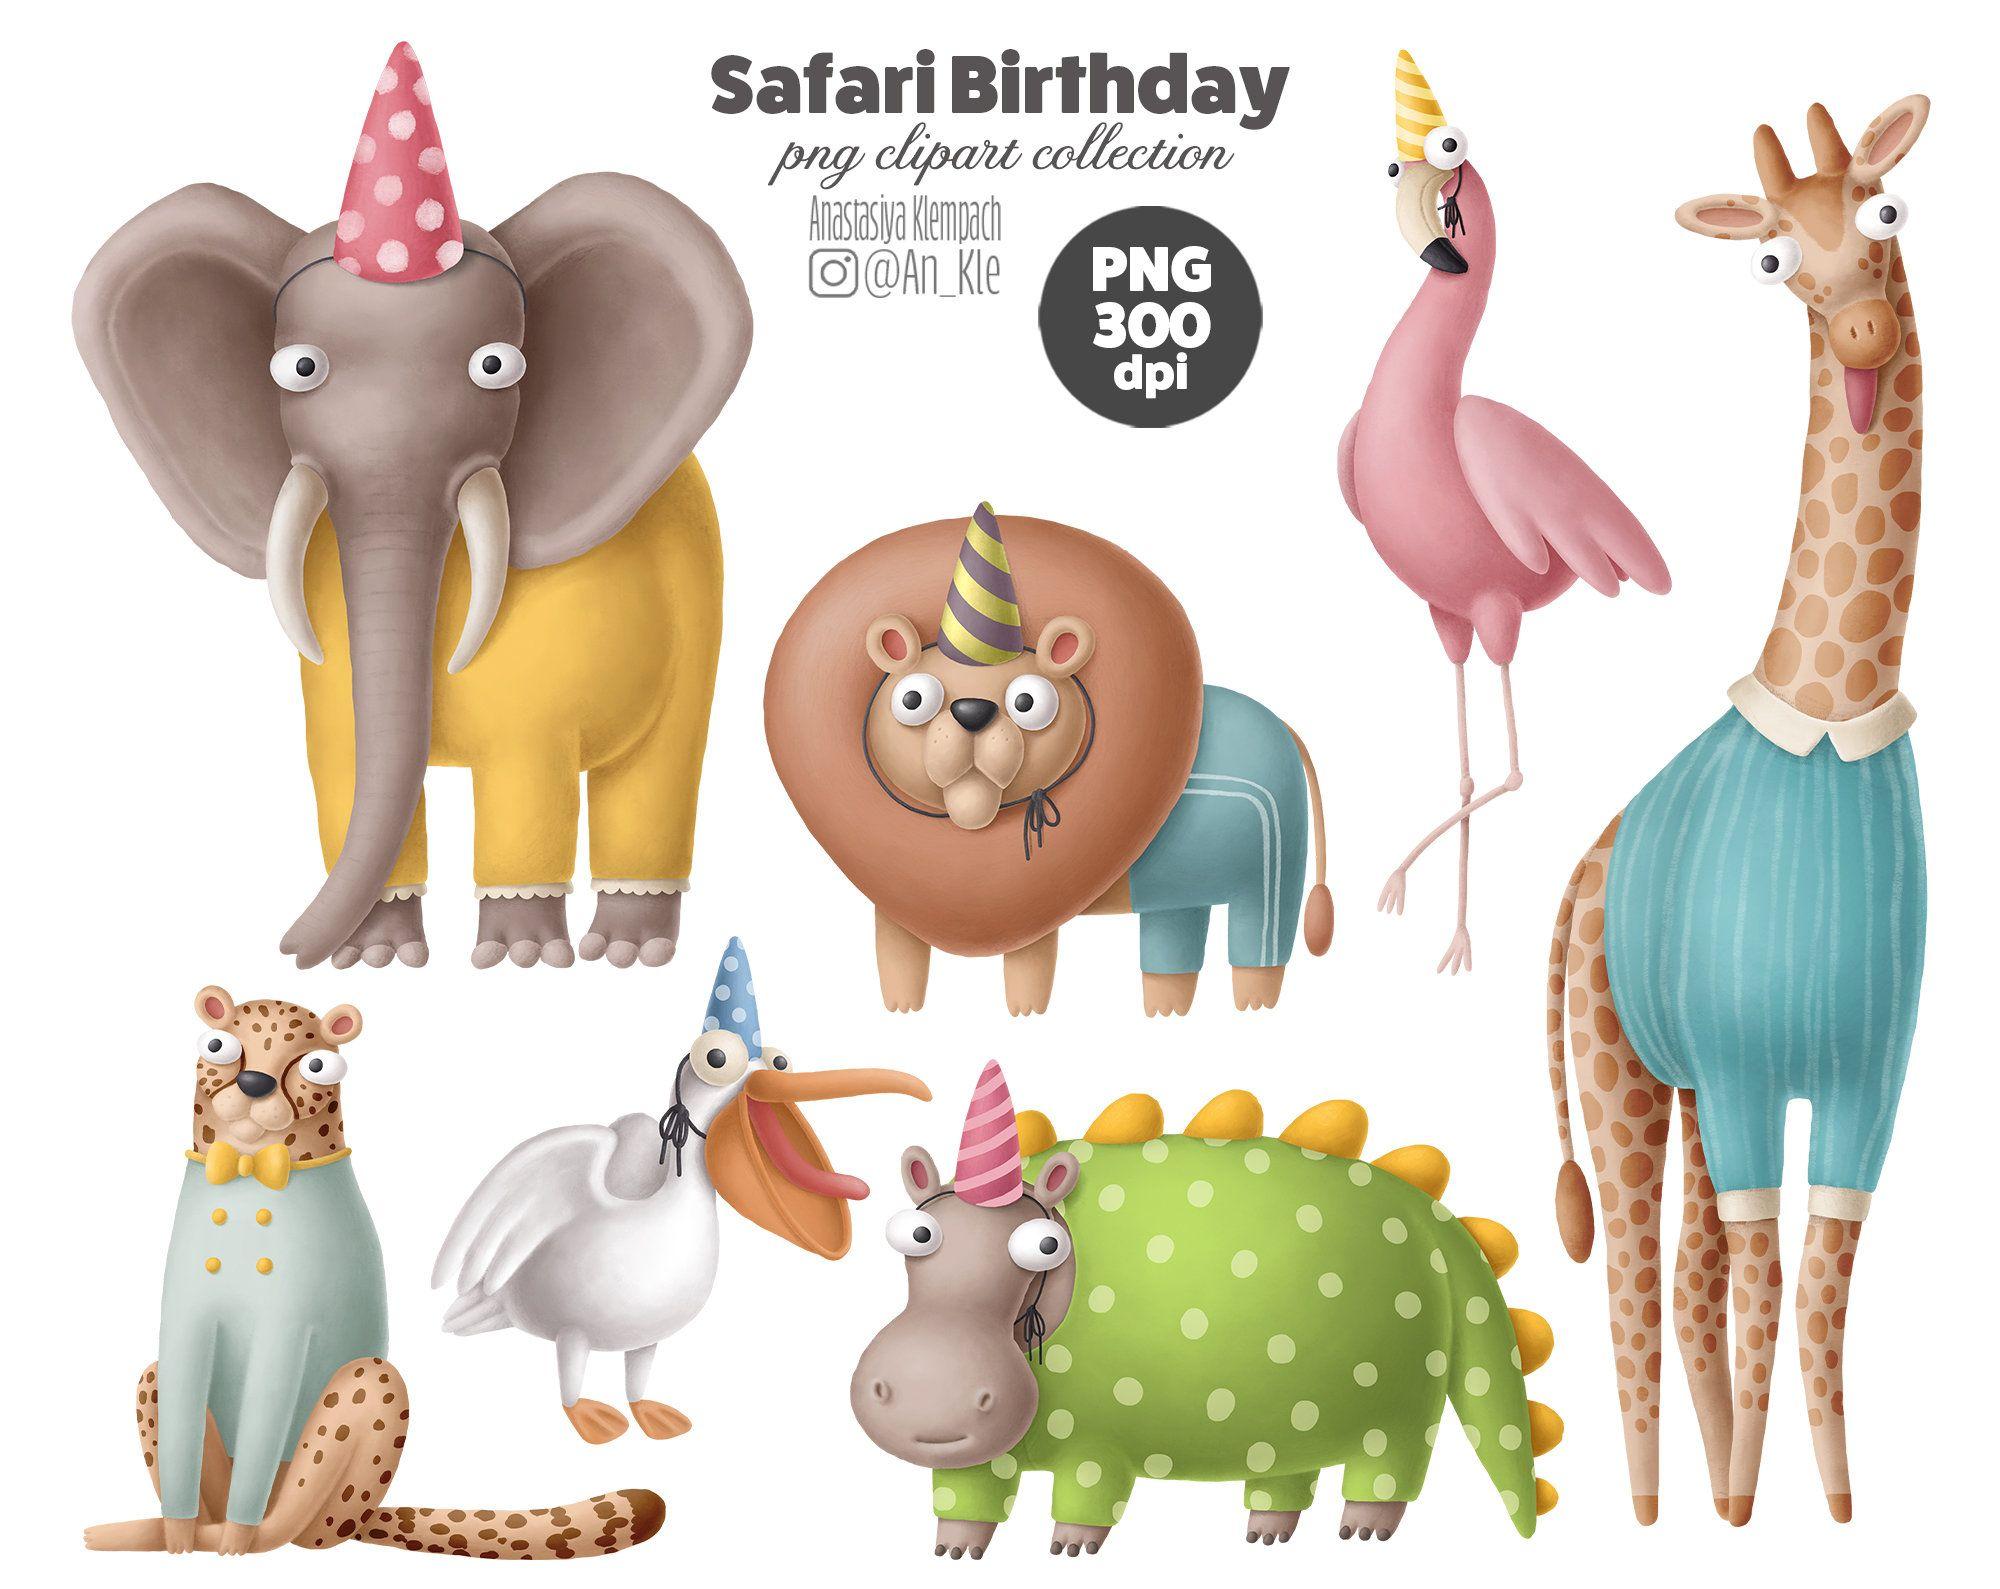 Safari Birthday Animals Clip Art Set Cute Funny African Etsy In 2021 Animal Birthday Safari Birthday African Animals